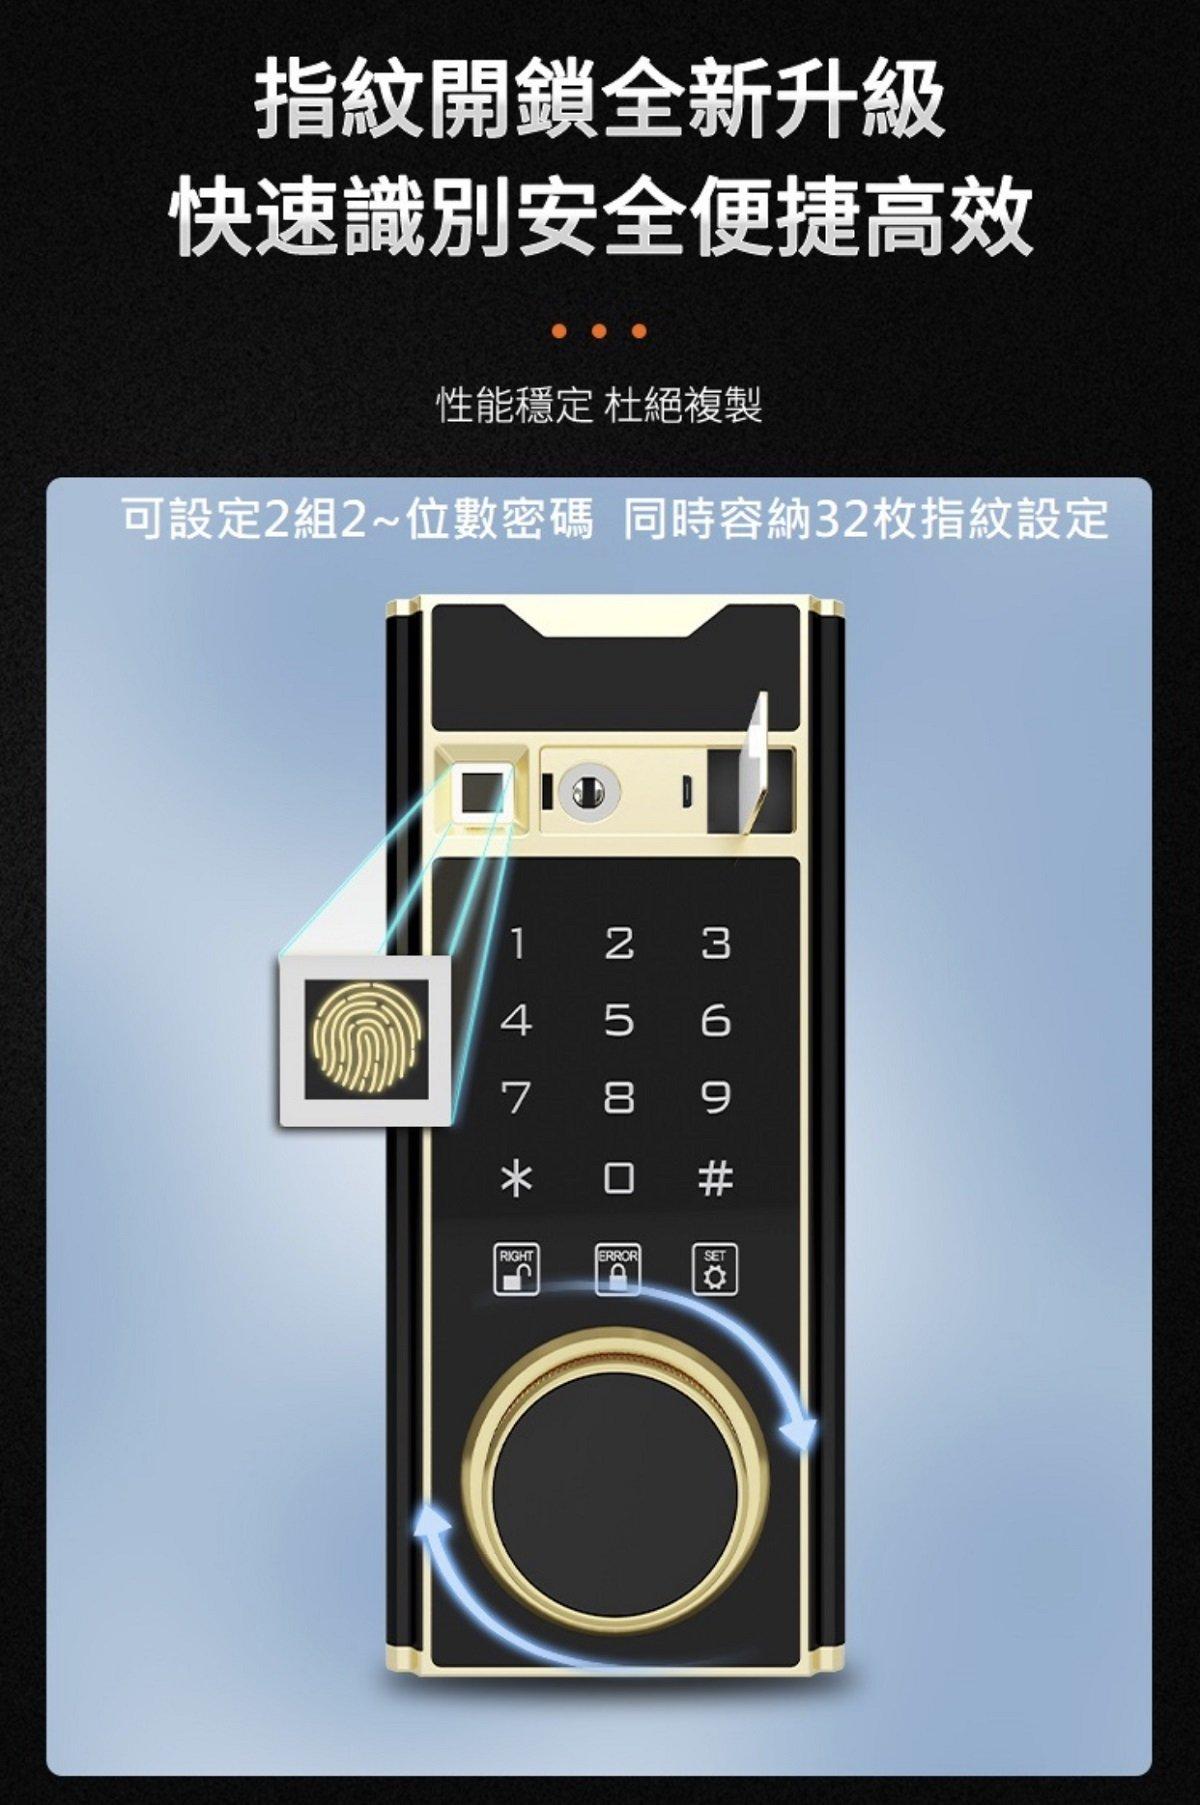 Marketing graphic-PB60-4